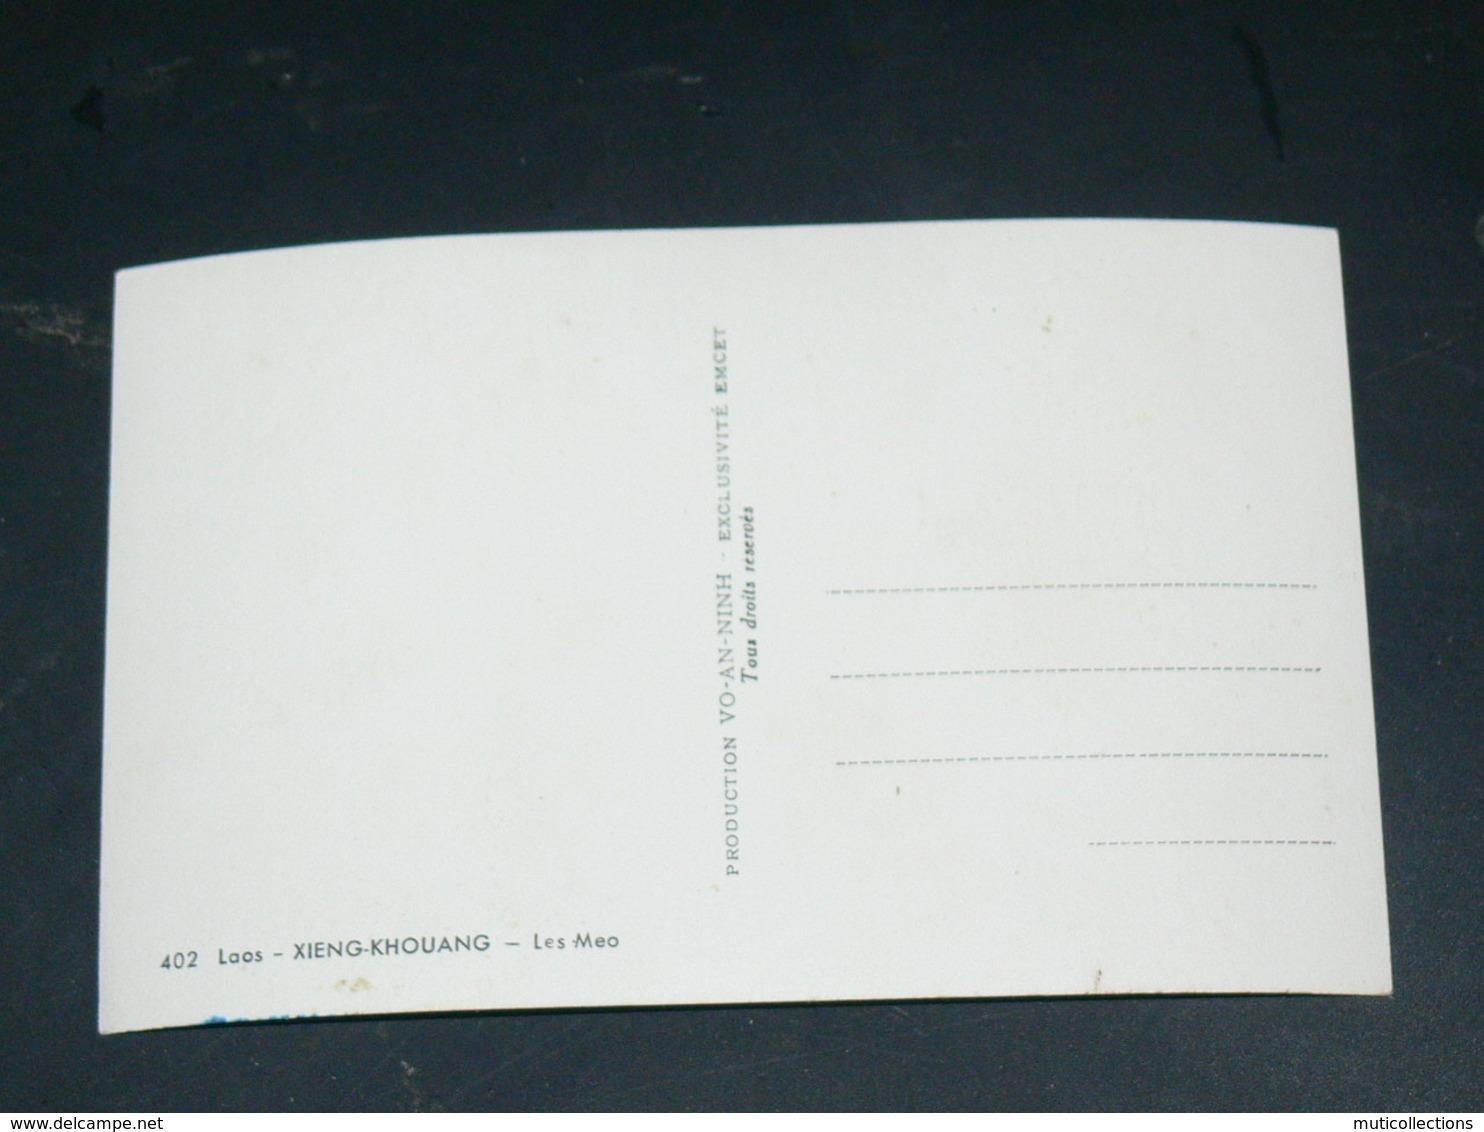 LAOS 1950  / INDOCHINE TONKIN / XIENG  KHOUANG  /  PHOSAVAN  / TYPE LES MEO / EDITION - Laos